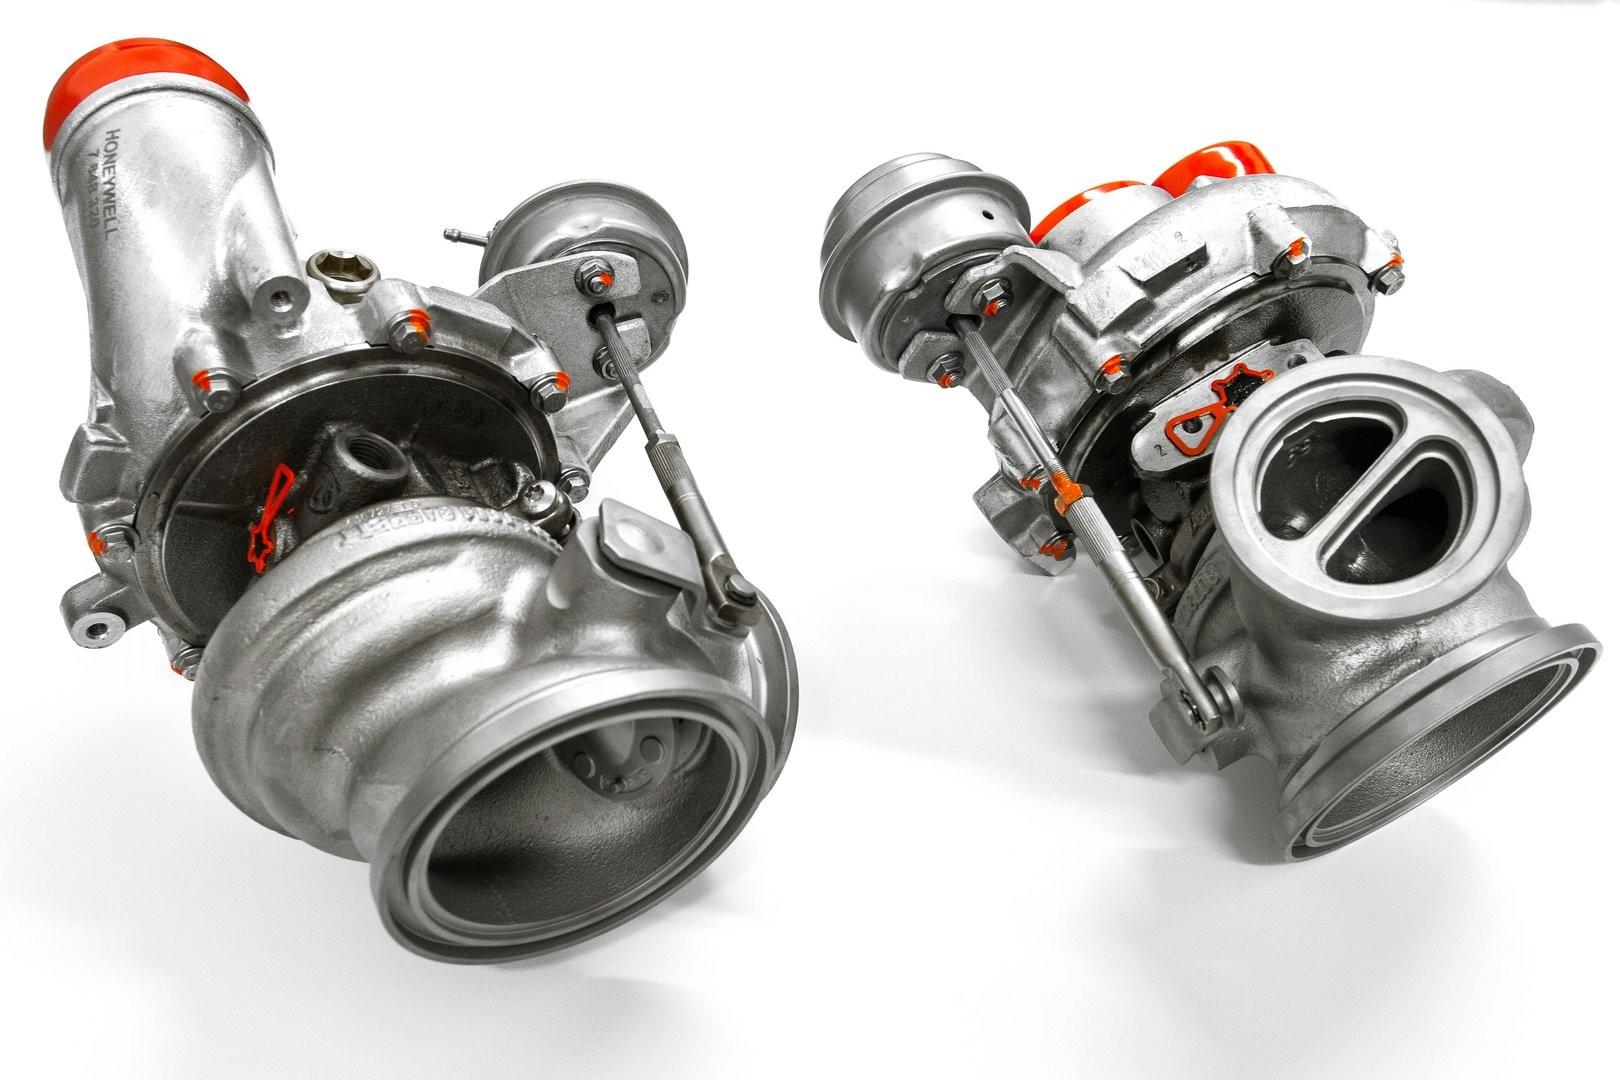 Mercedes-AMG G63 Wheelsandmore - Mercedes-AMG G63 Wheelsandmore